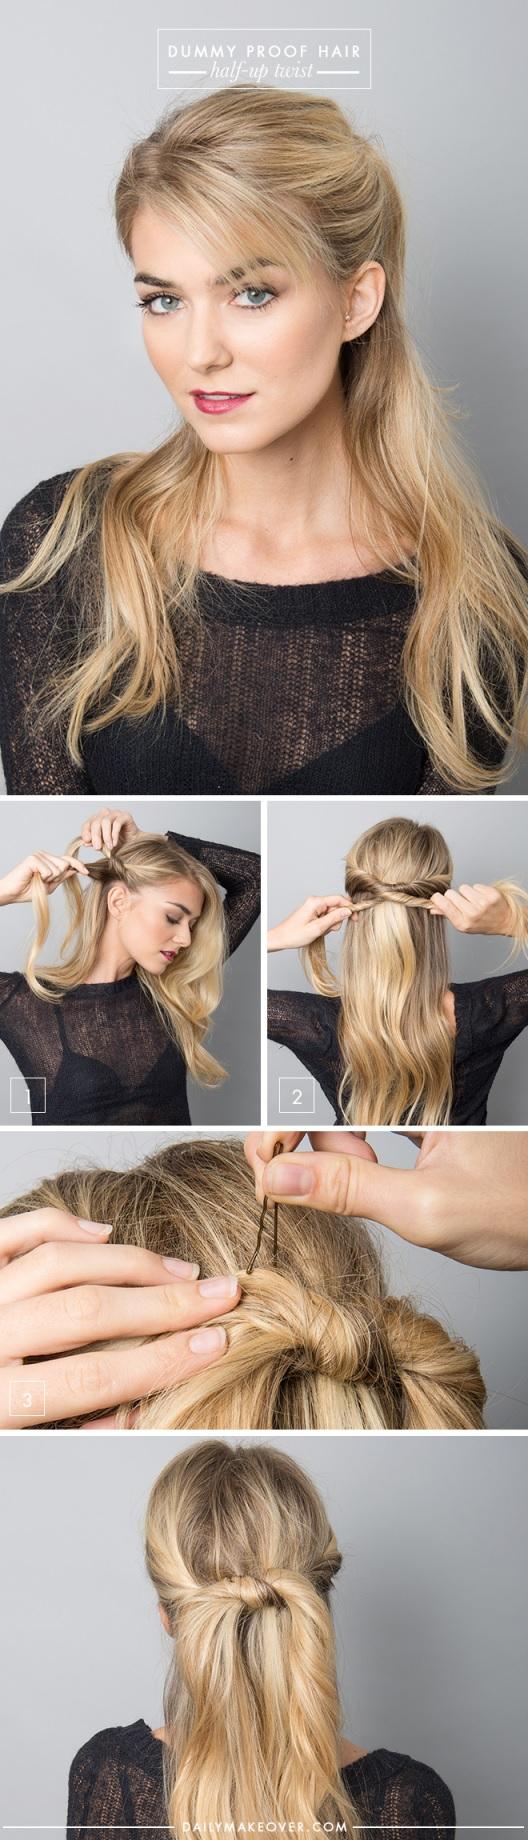 coiffure-simple-rapide-23